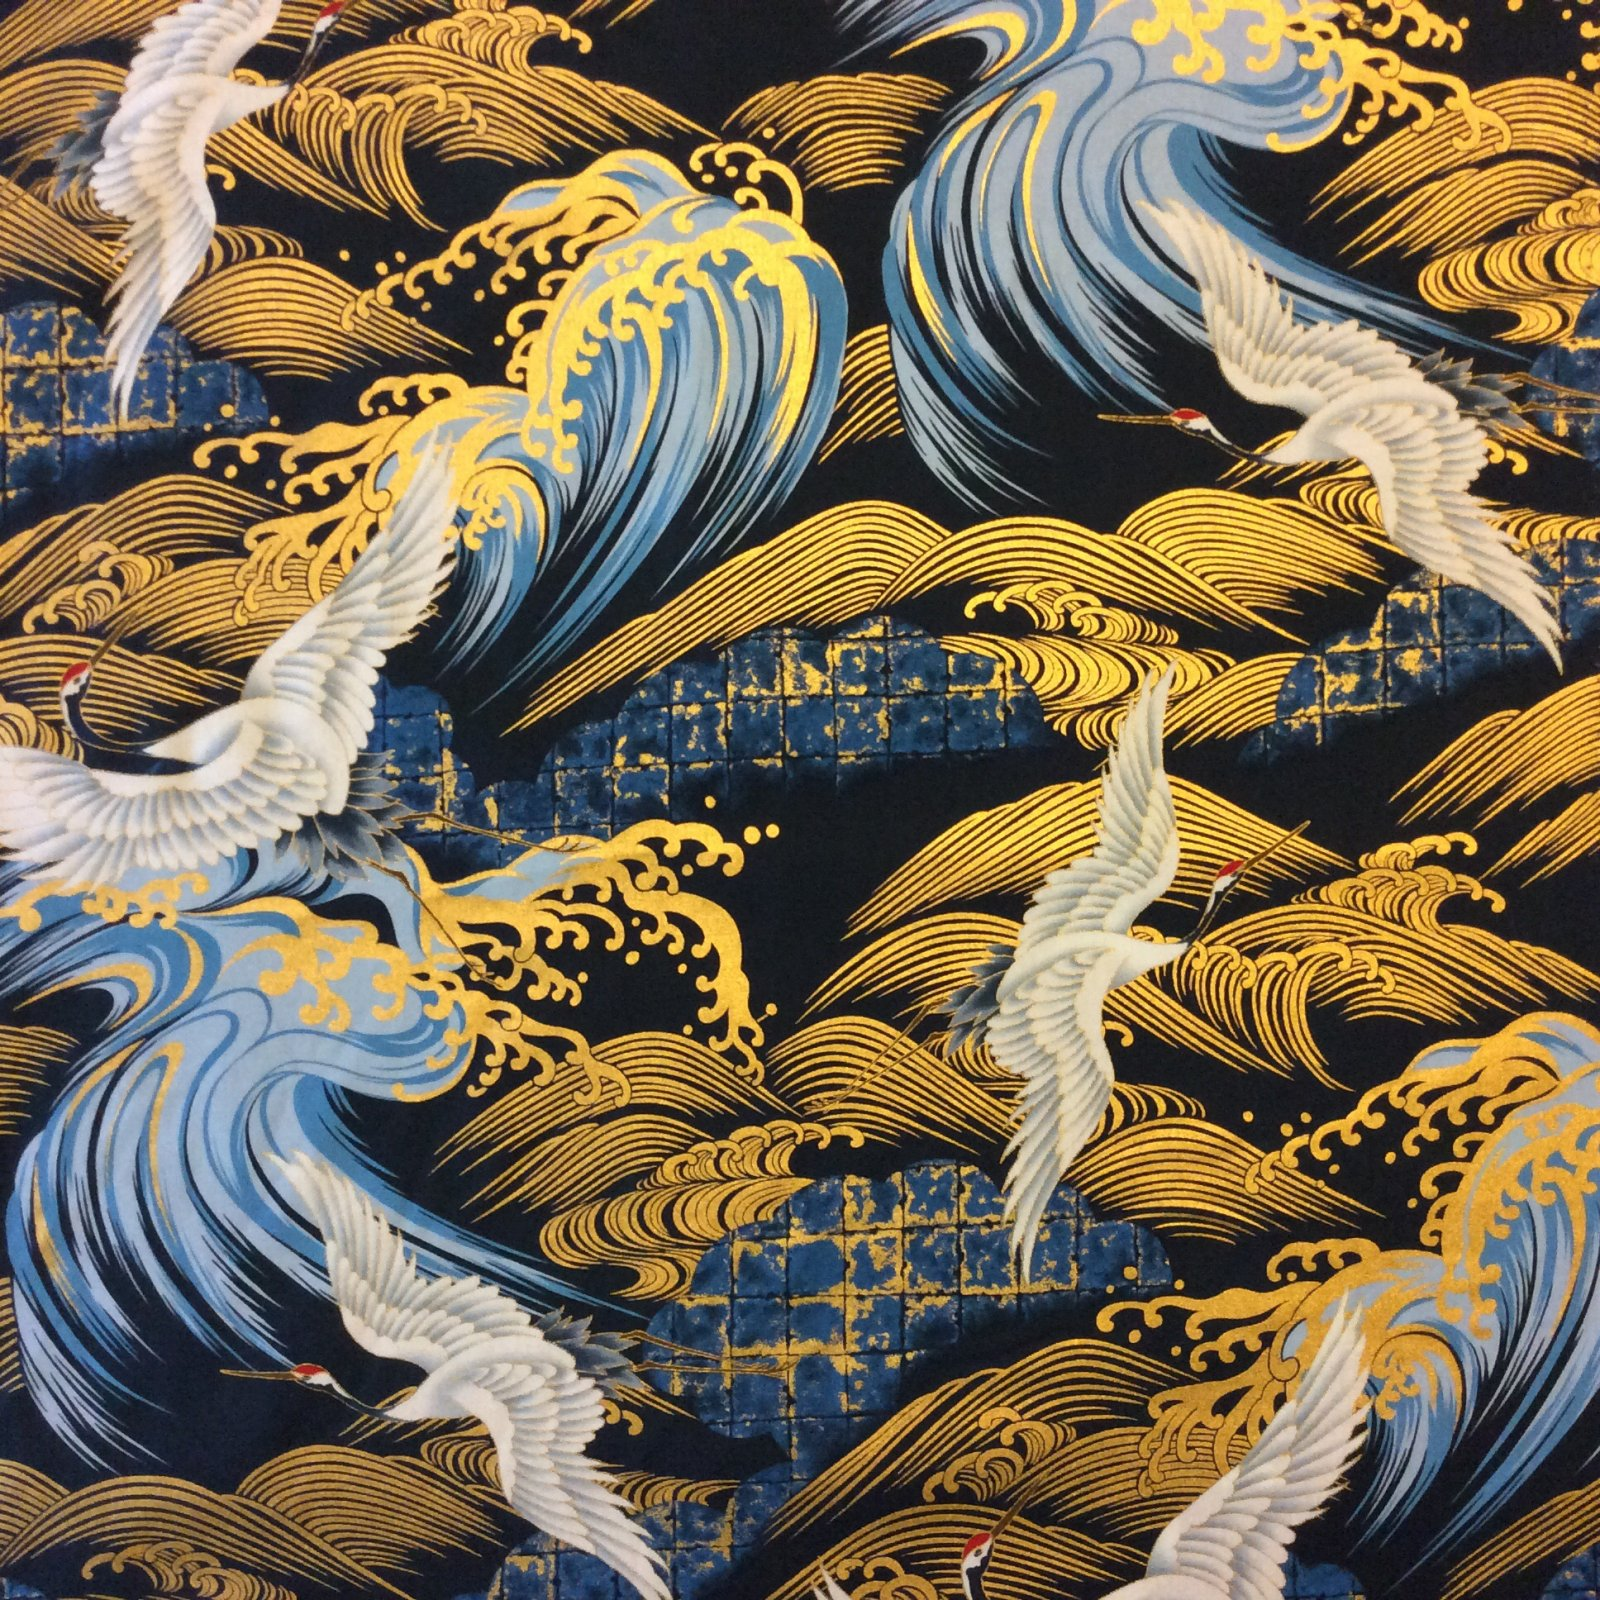 Kona Bay Cranes Waves Birds Japanese Asian Kona Bay Cotton Quilt Fabric KB24